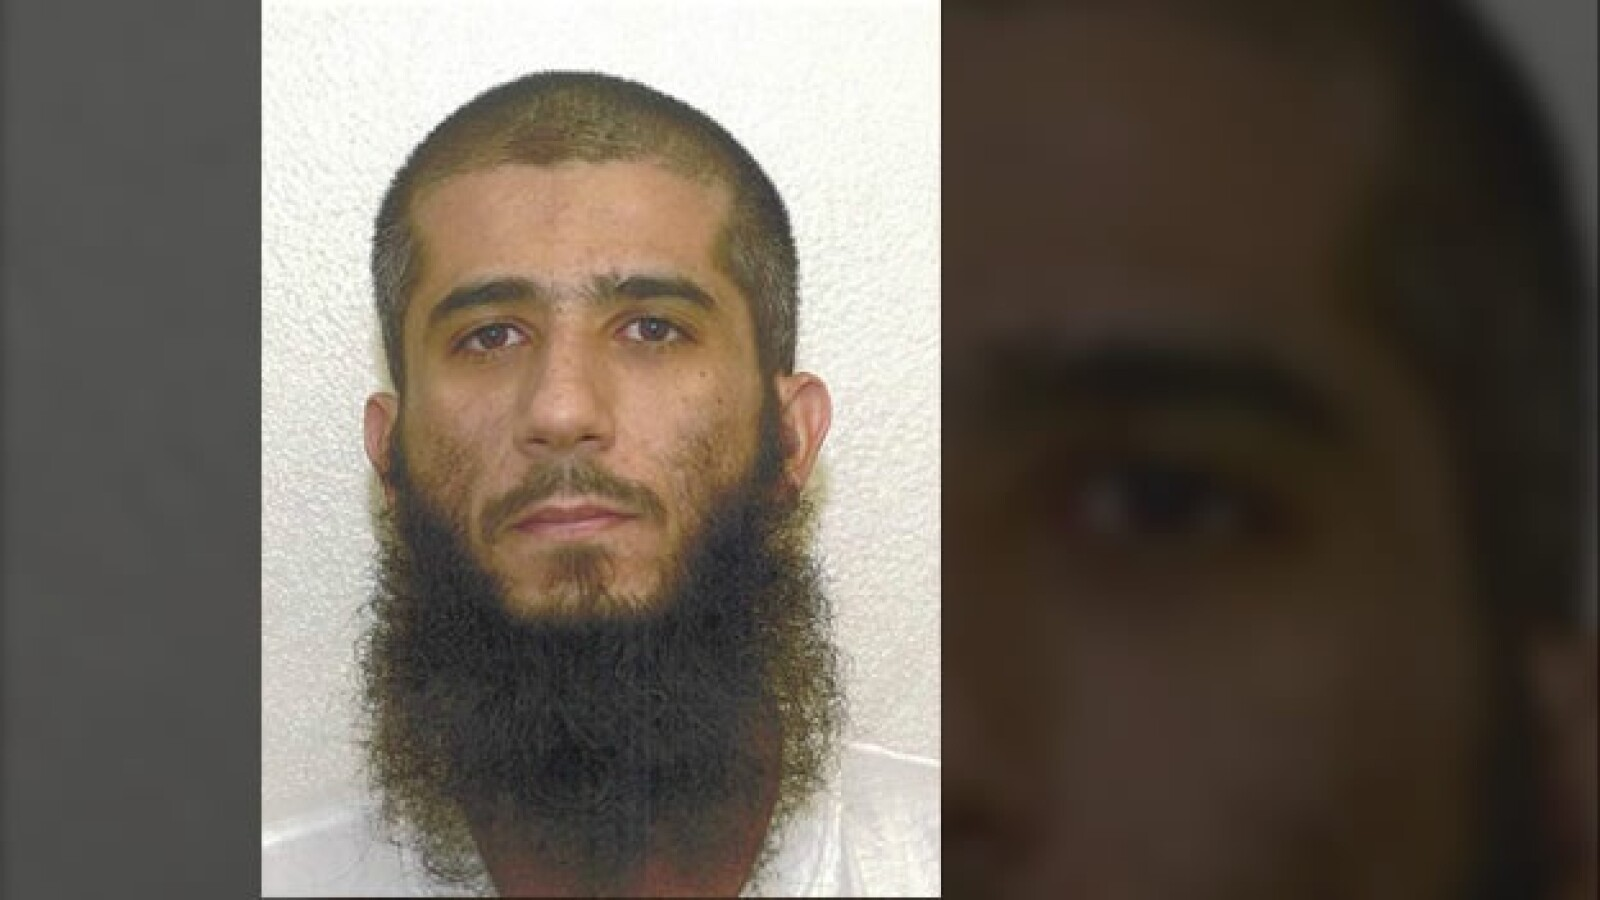 Guantánamo - Fayiz Mohammed AhmedAl Kandari